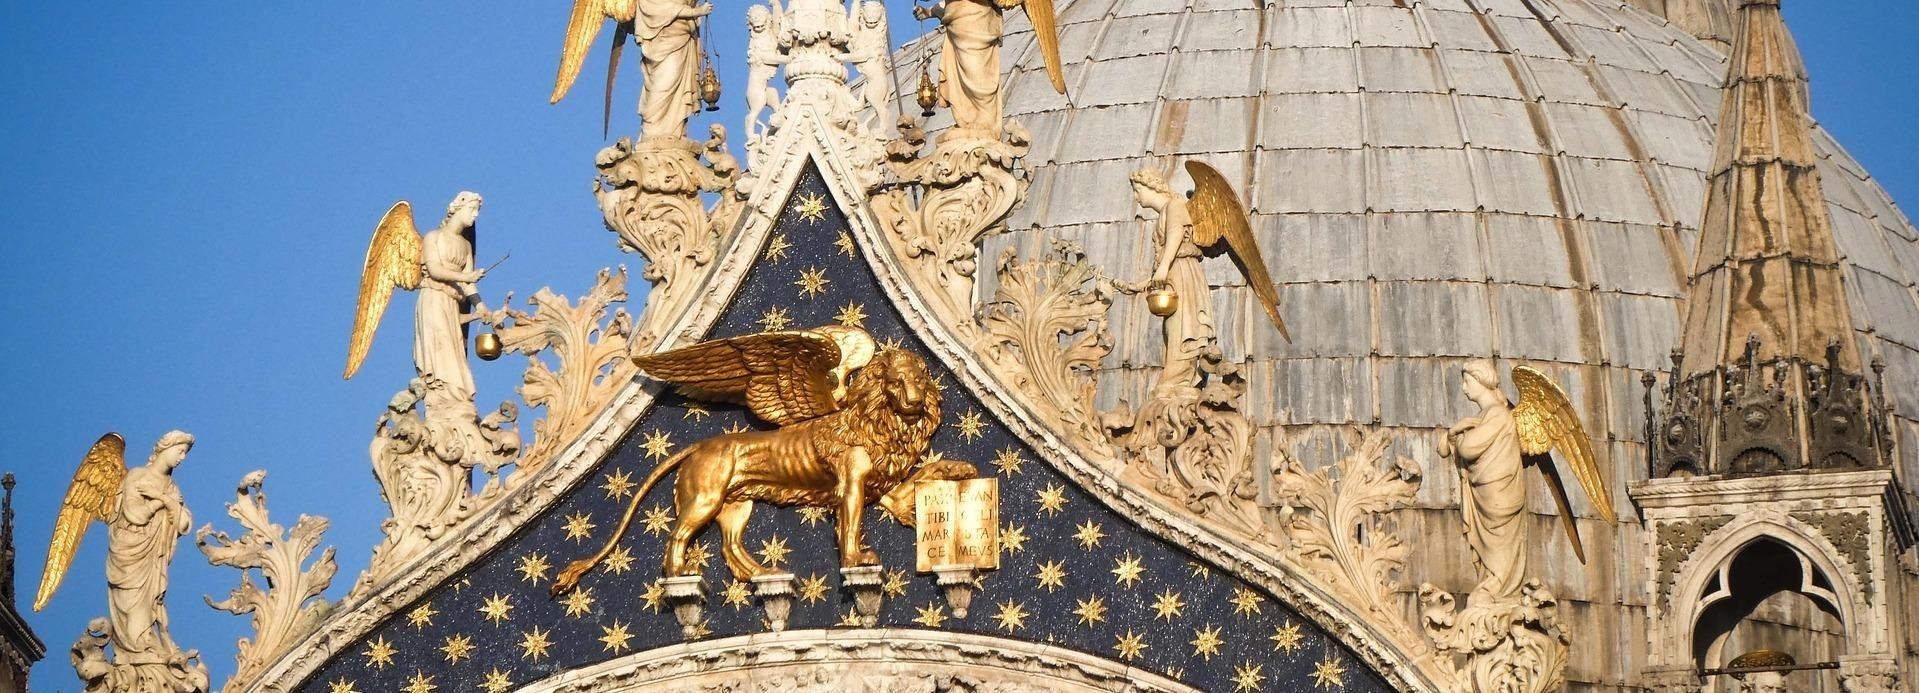 Venedig: Ganztägige Golden Gem Tour